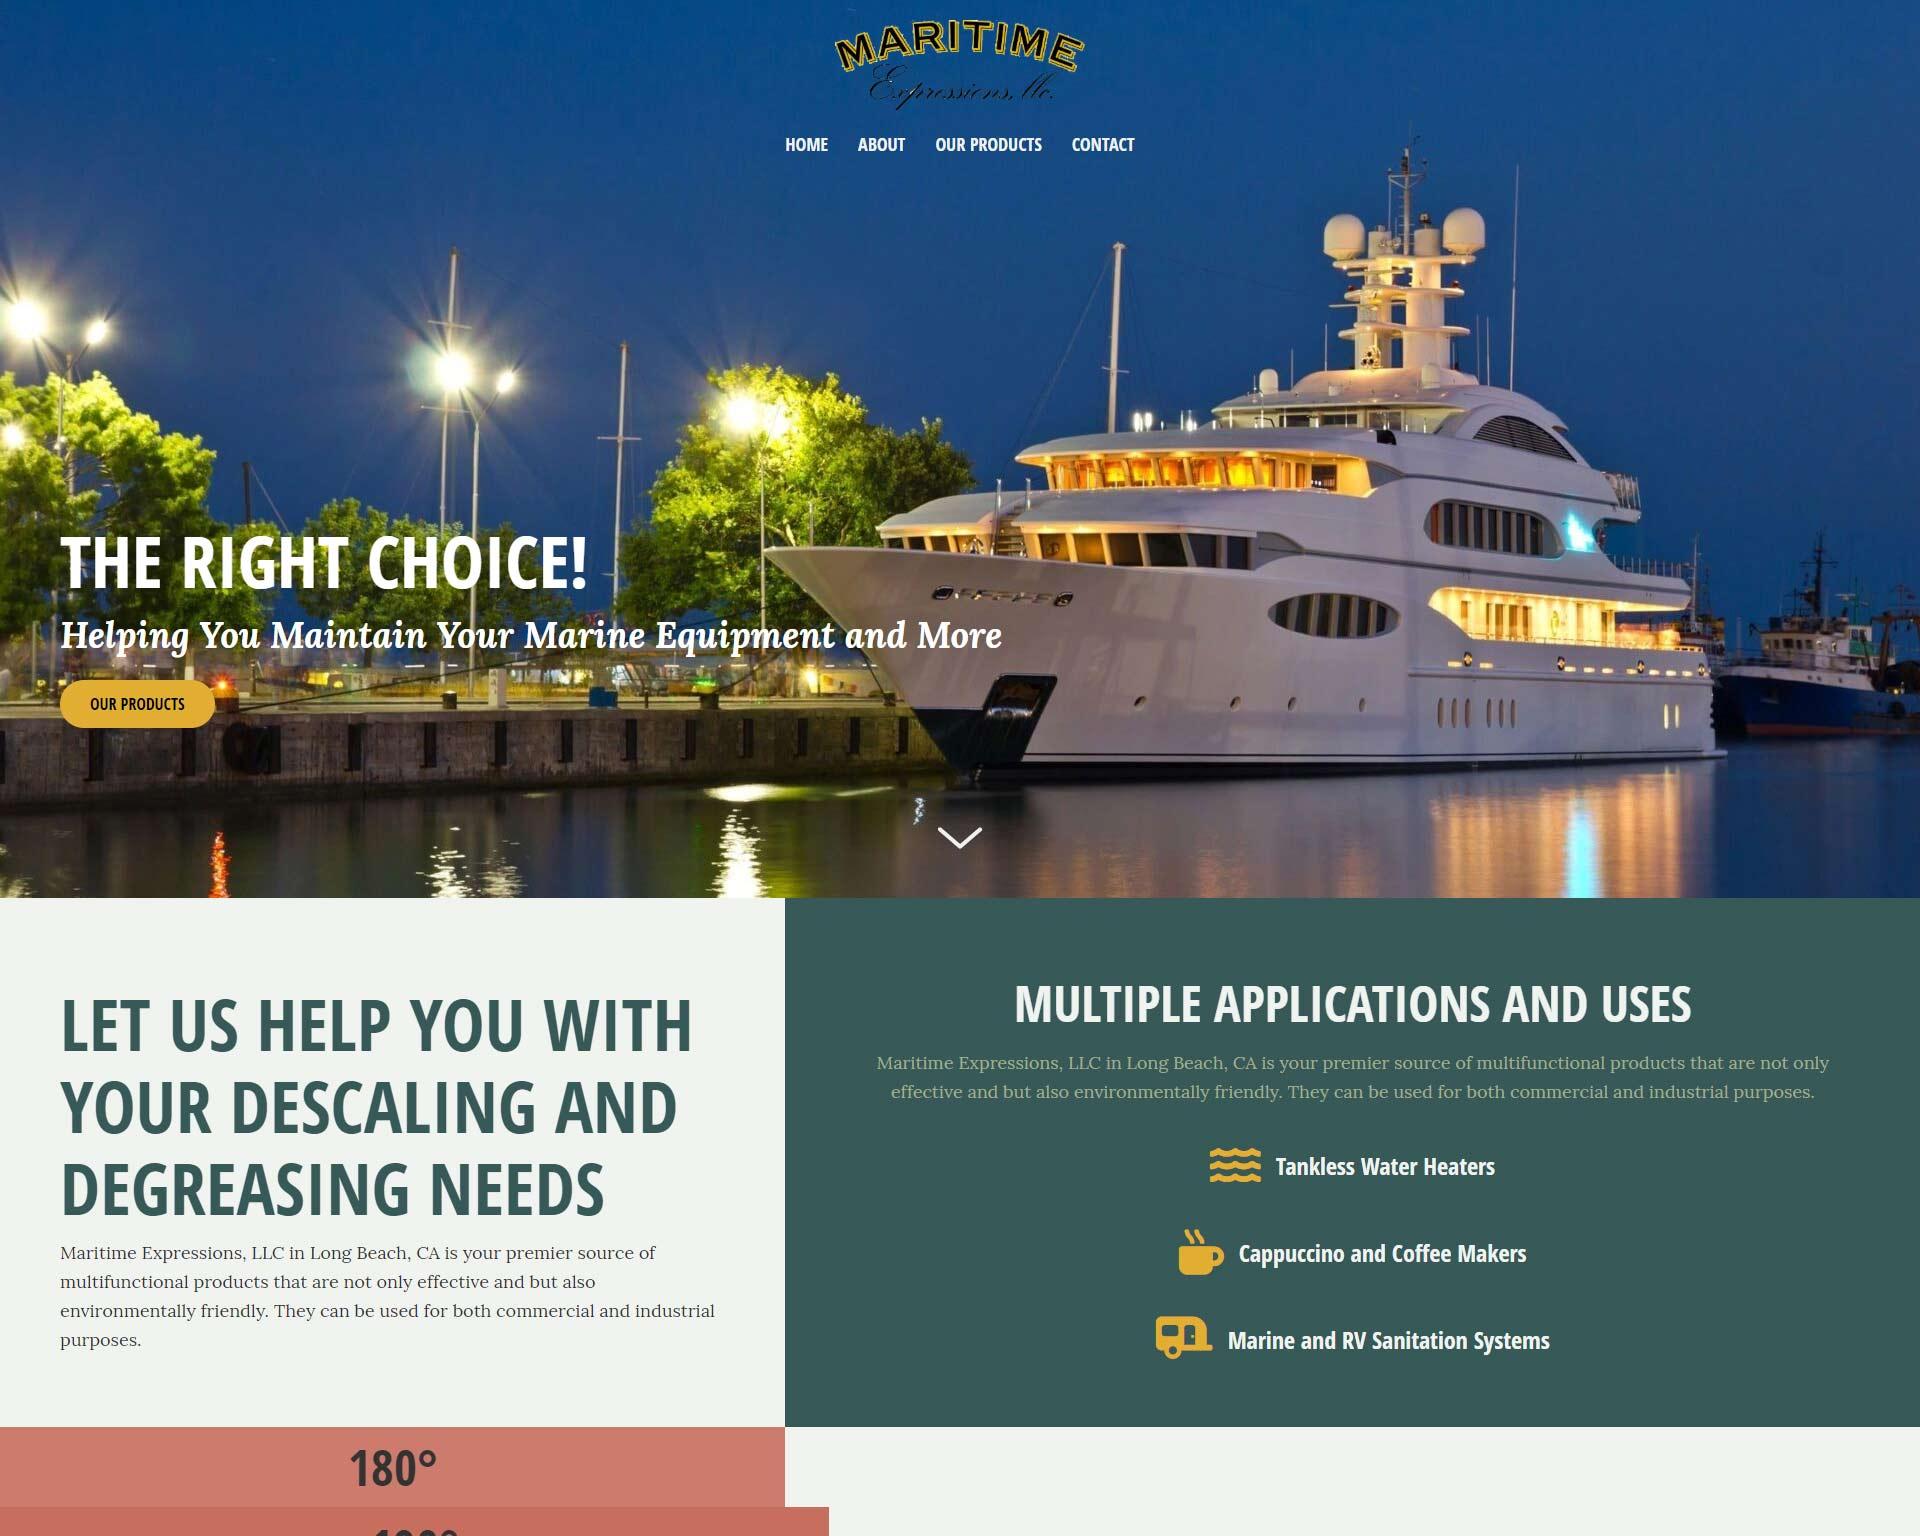 screencapture-jp3-6de-myftpupload-Maritime-Expressions-desktop